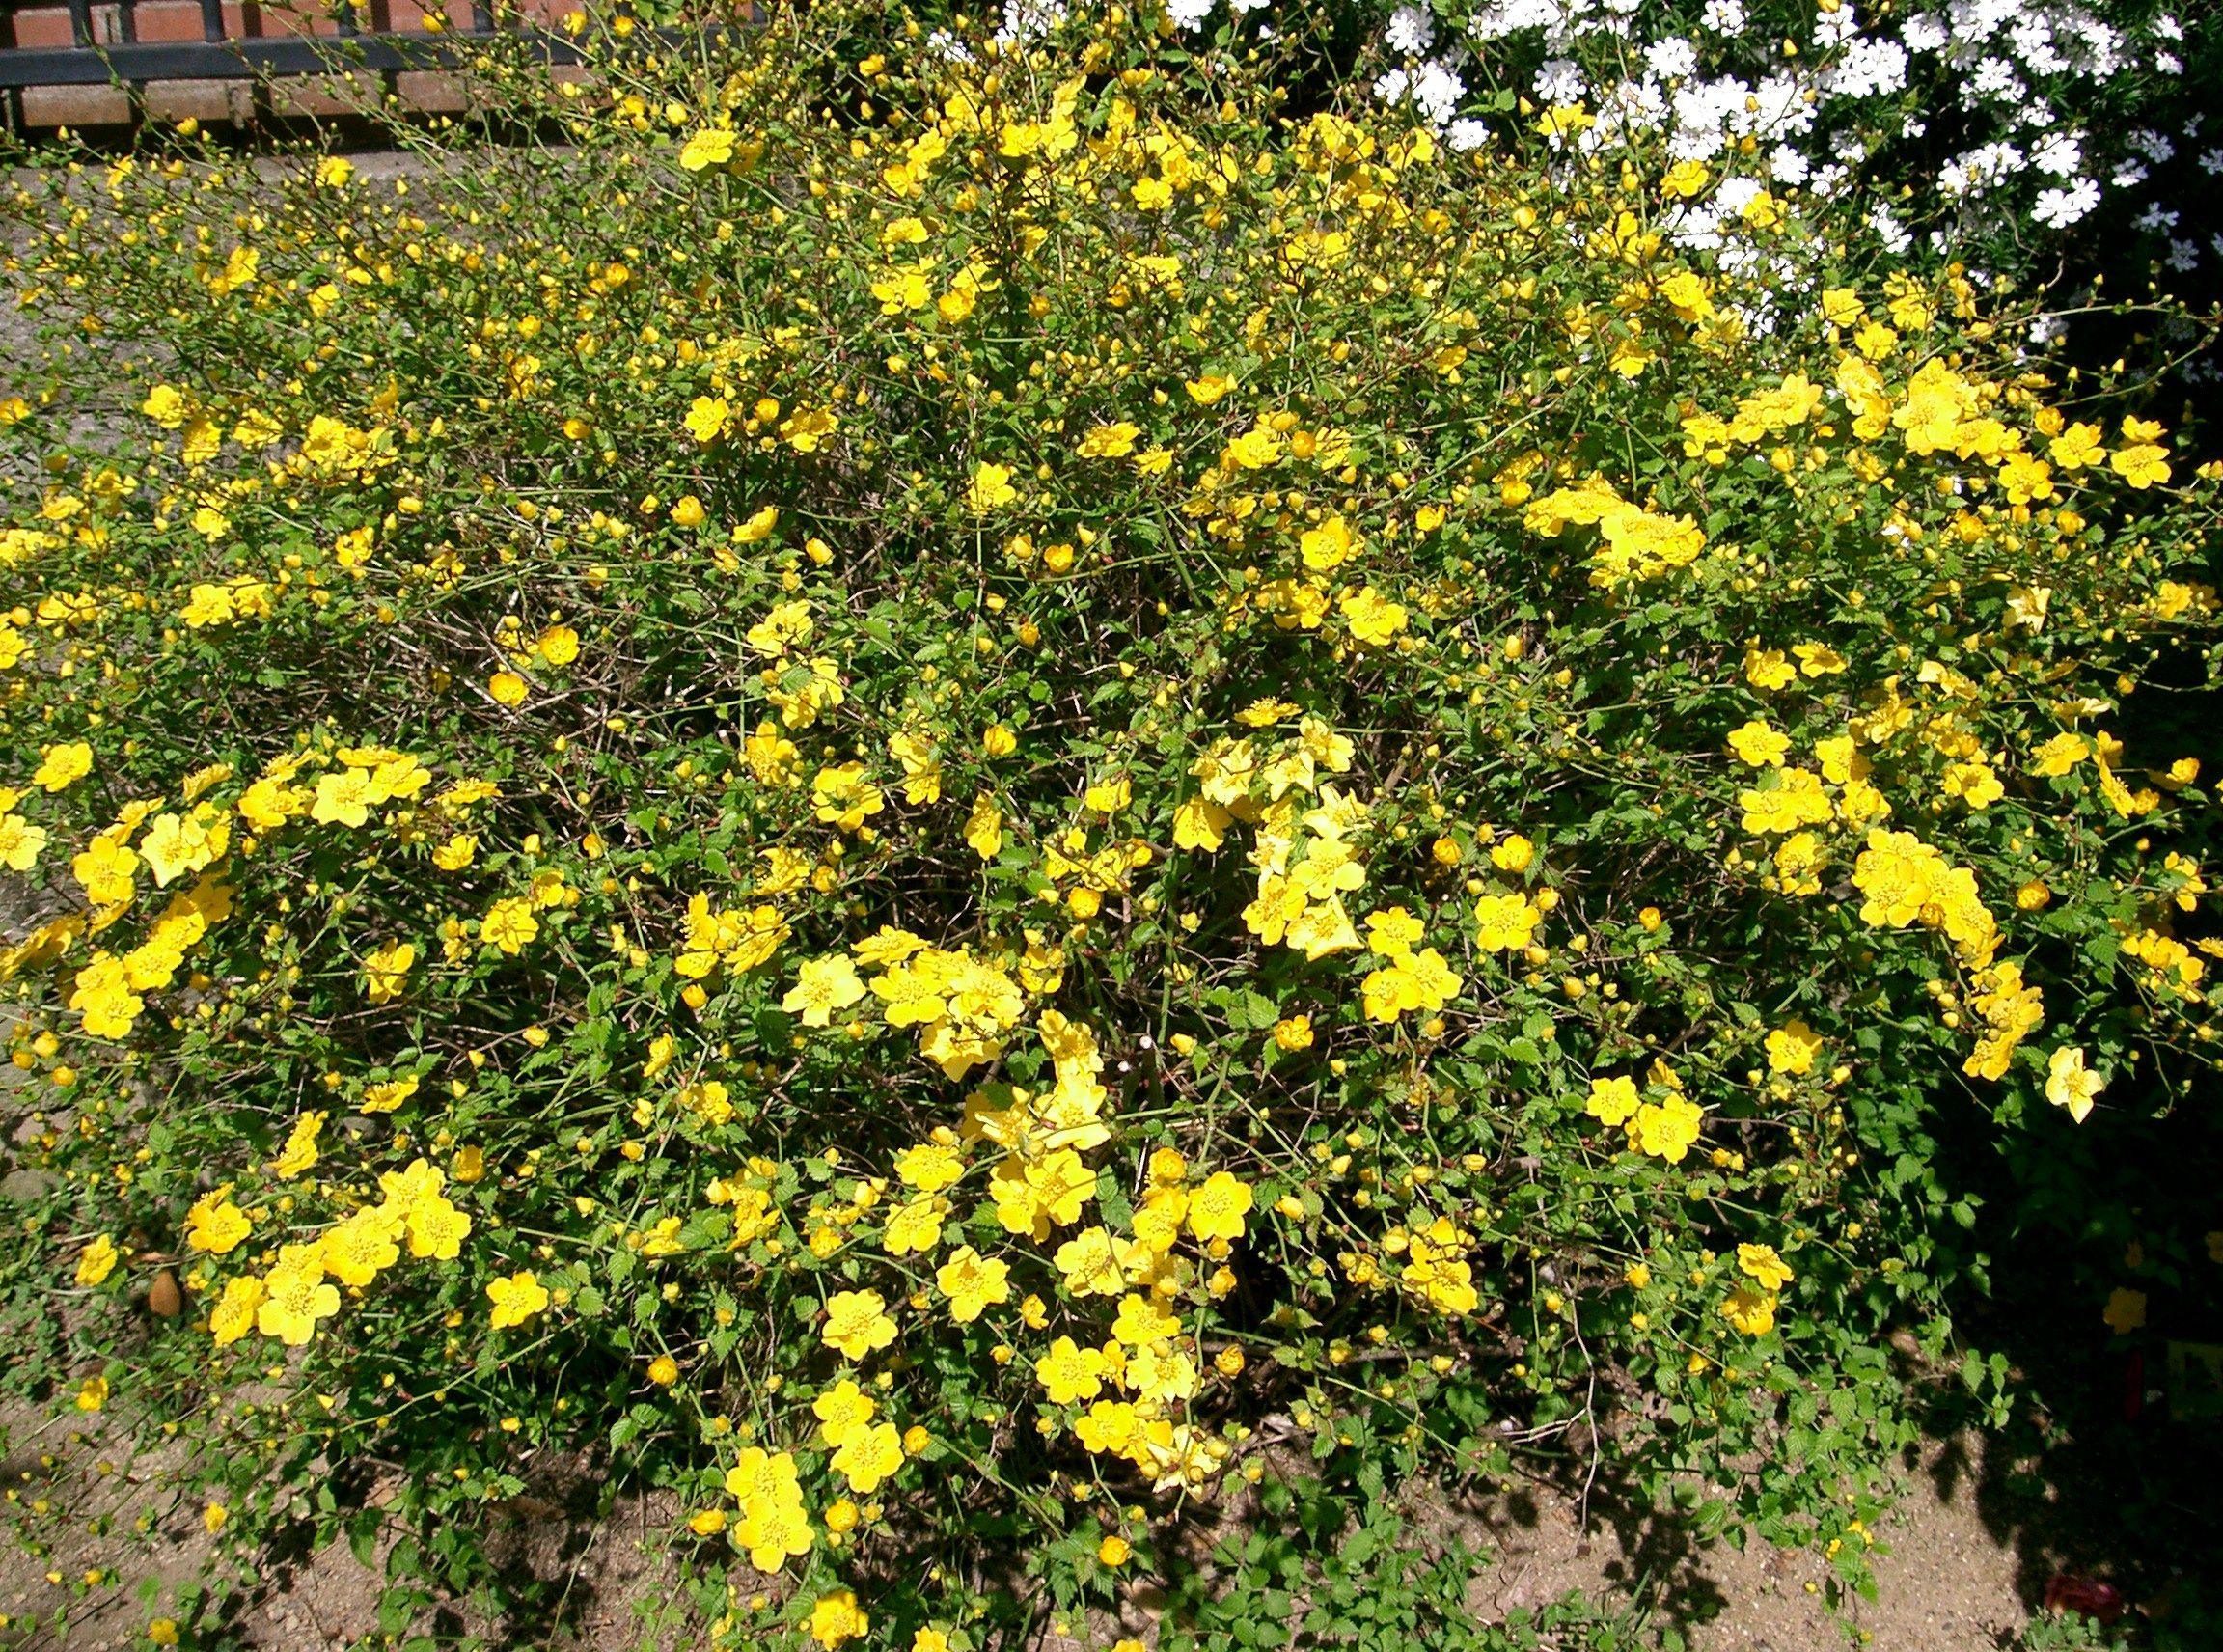 Kerria in full bloom